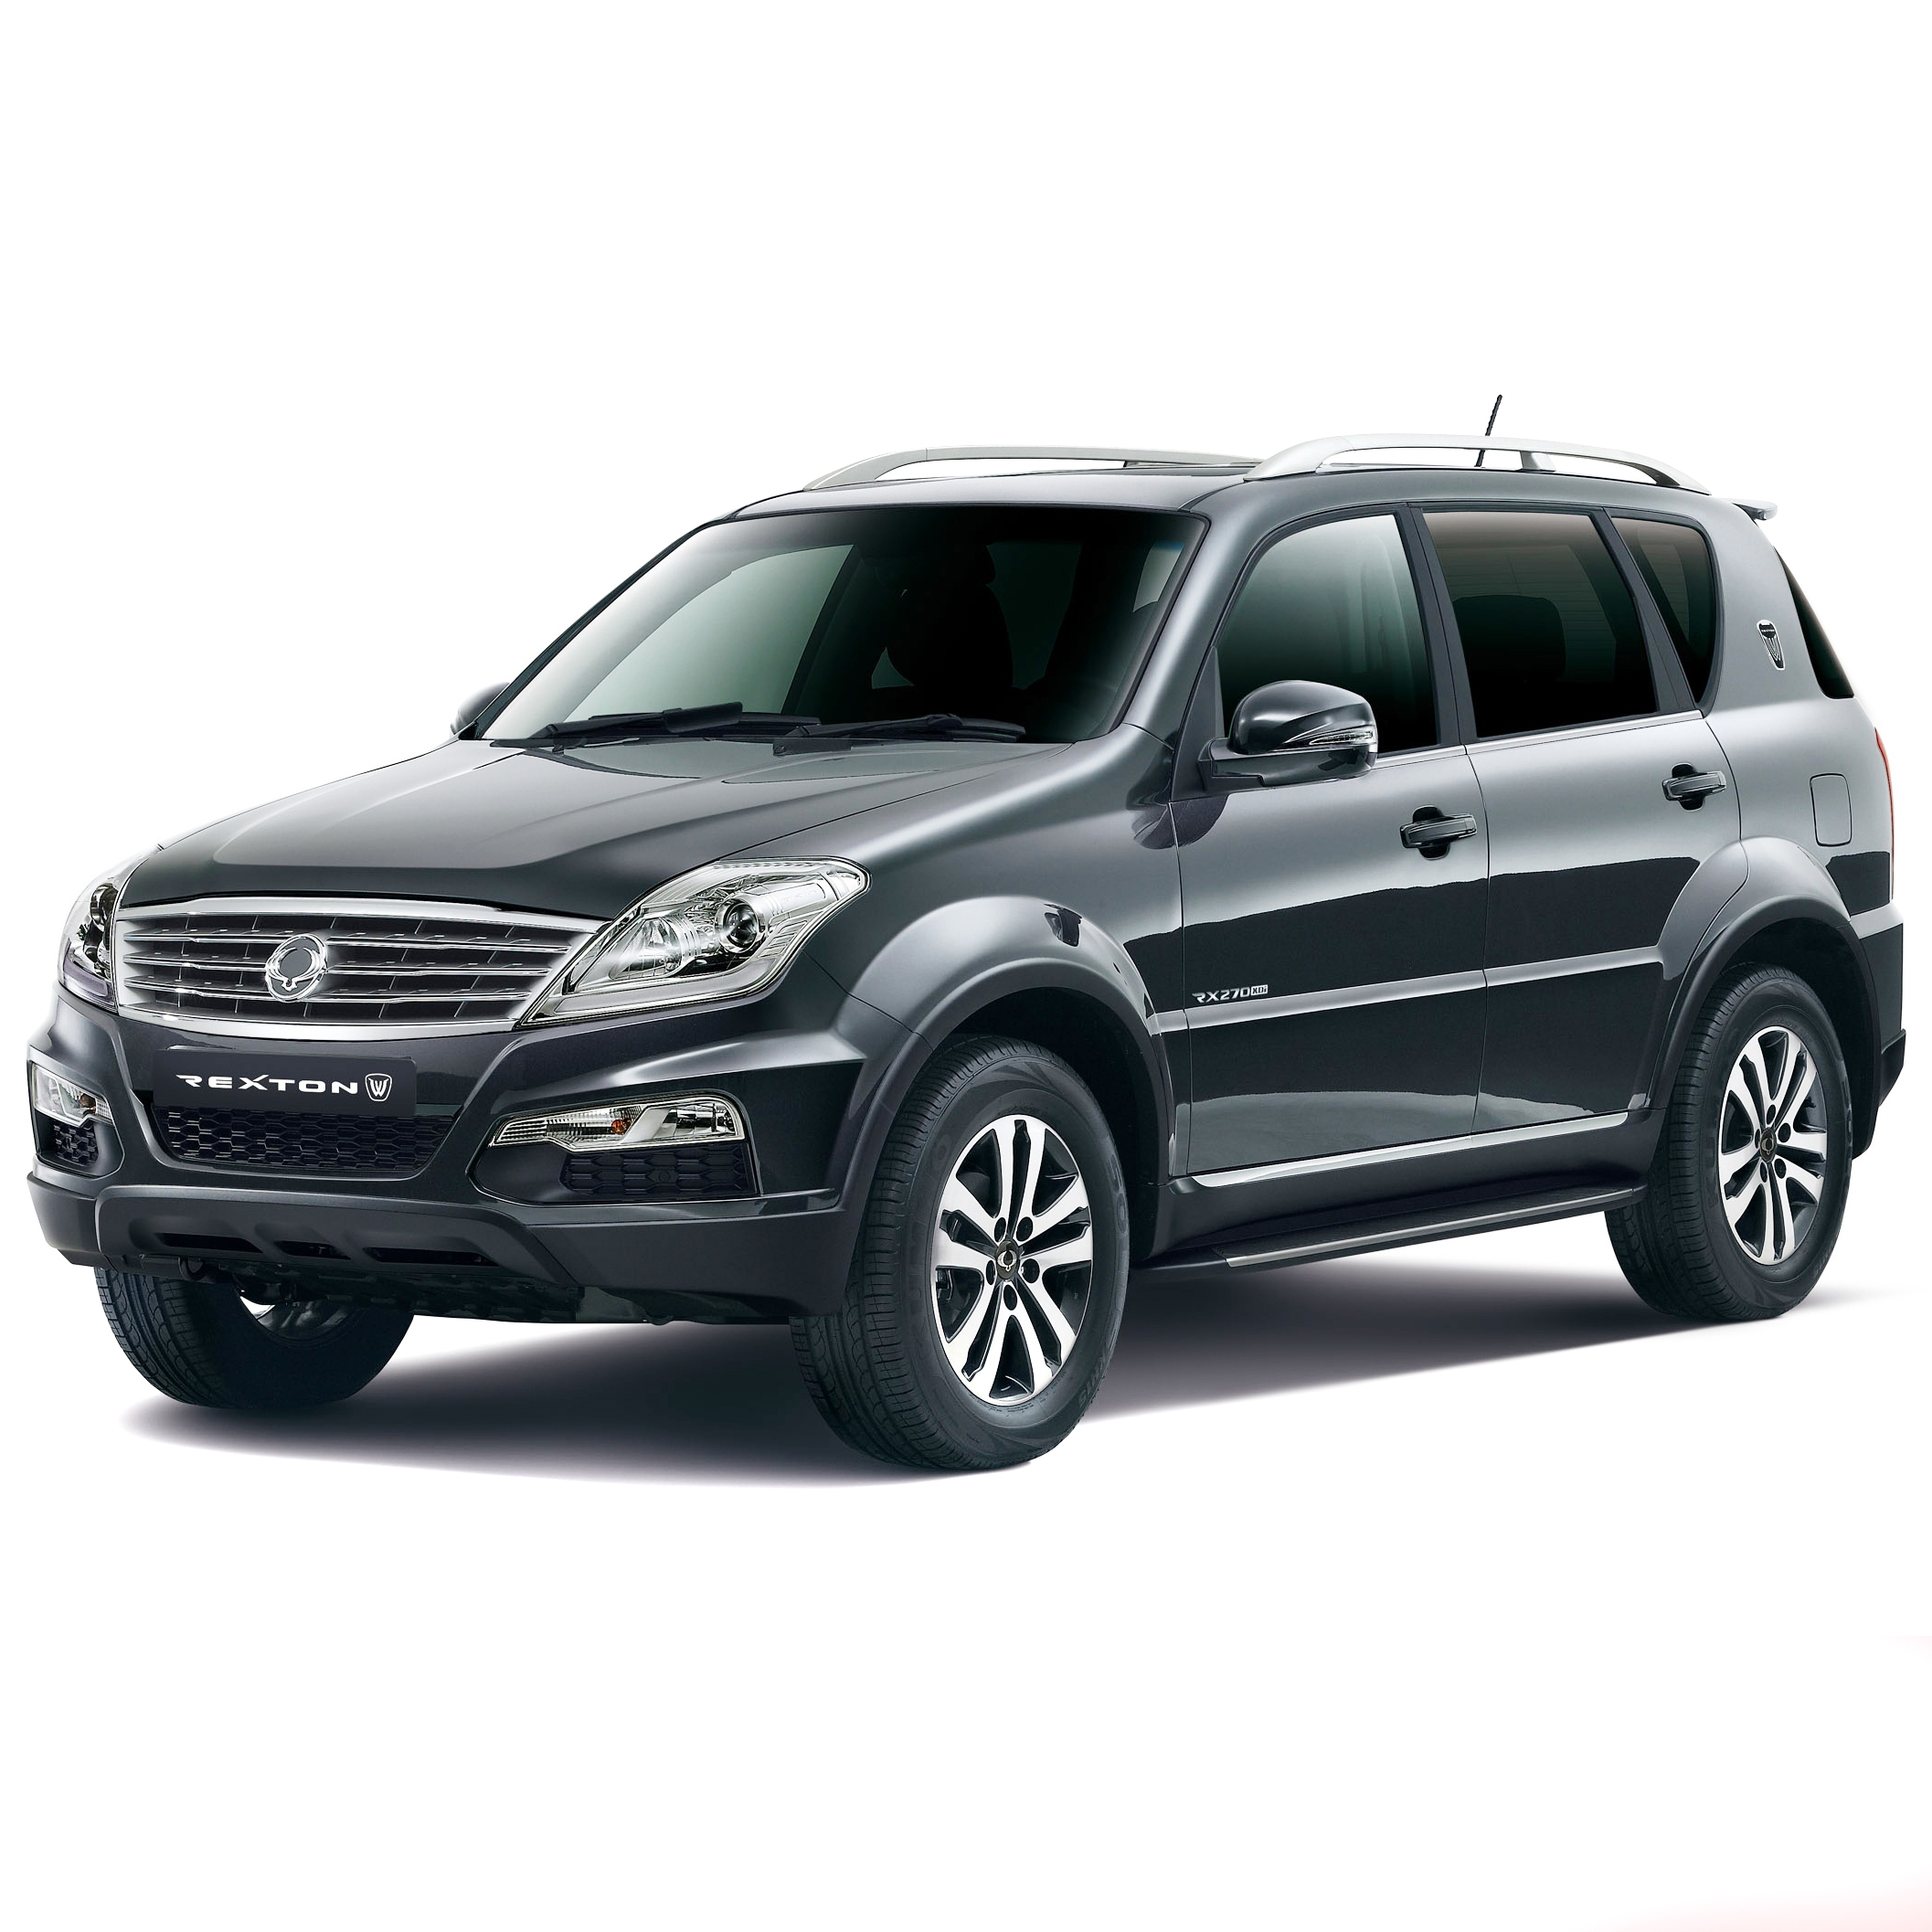 Ssang Yong Rexton Car Mats (All Models)